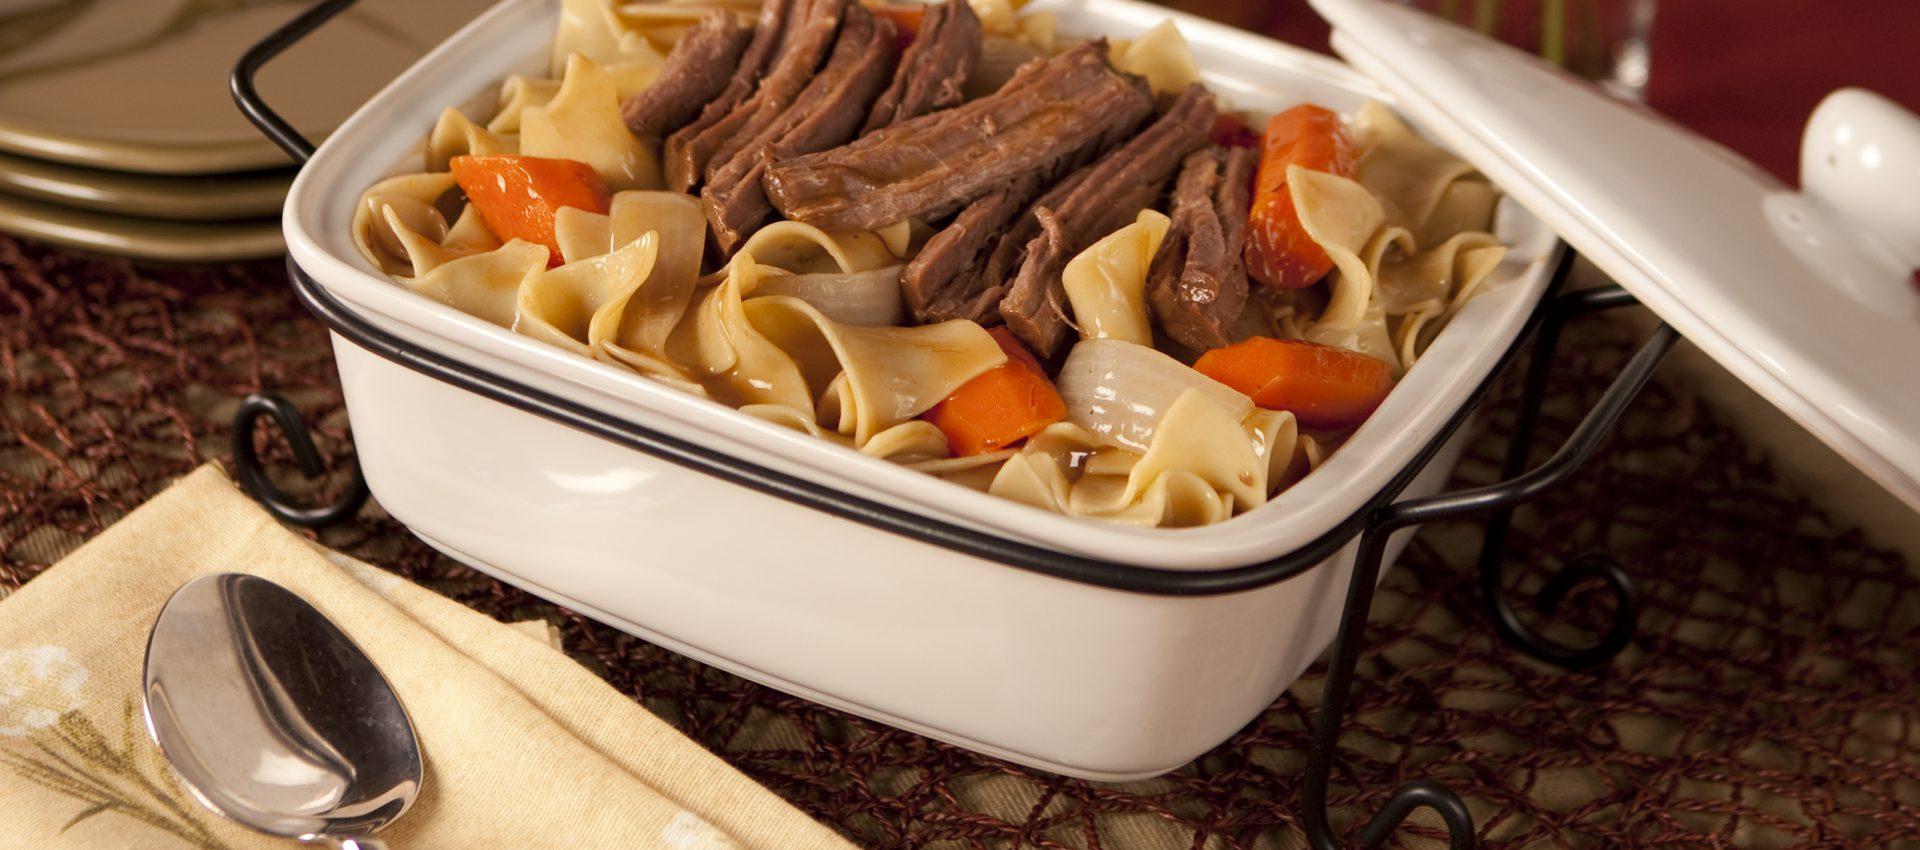 all_american_pot_roast_noodles_1-1920x850 Classic Pot Roast with Noodles